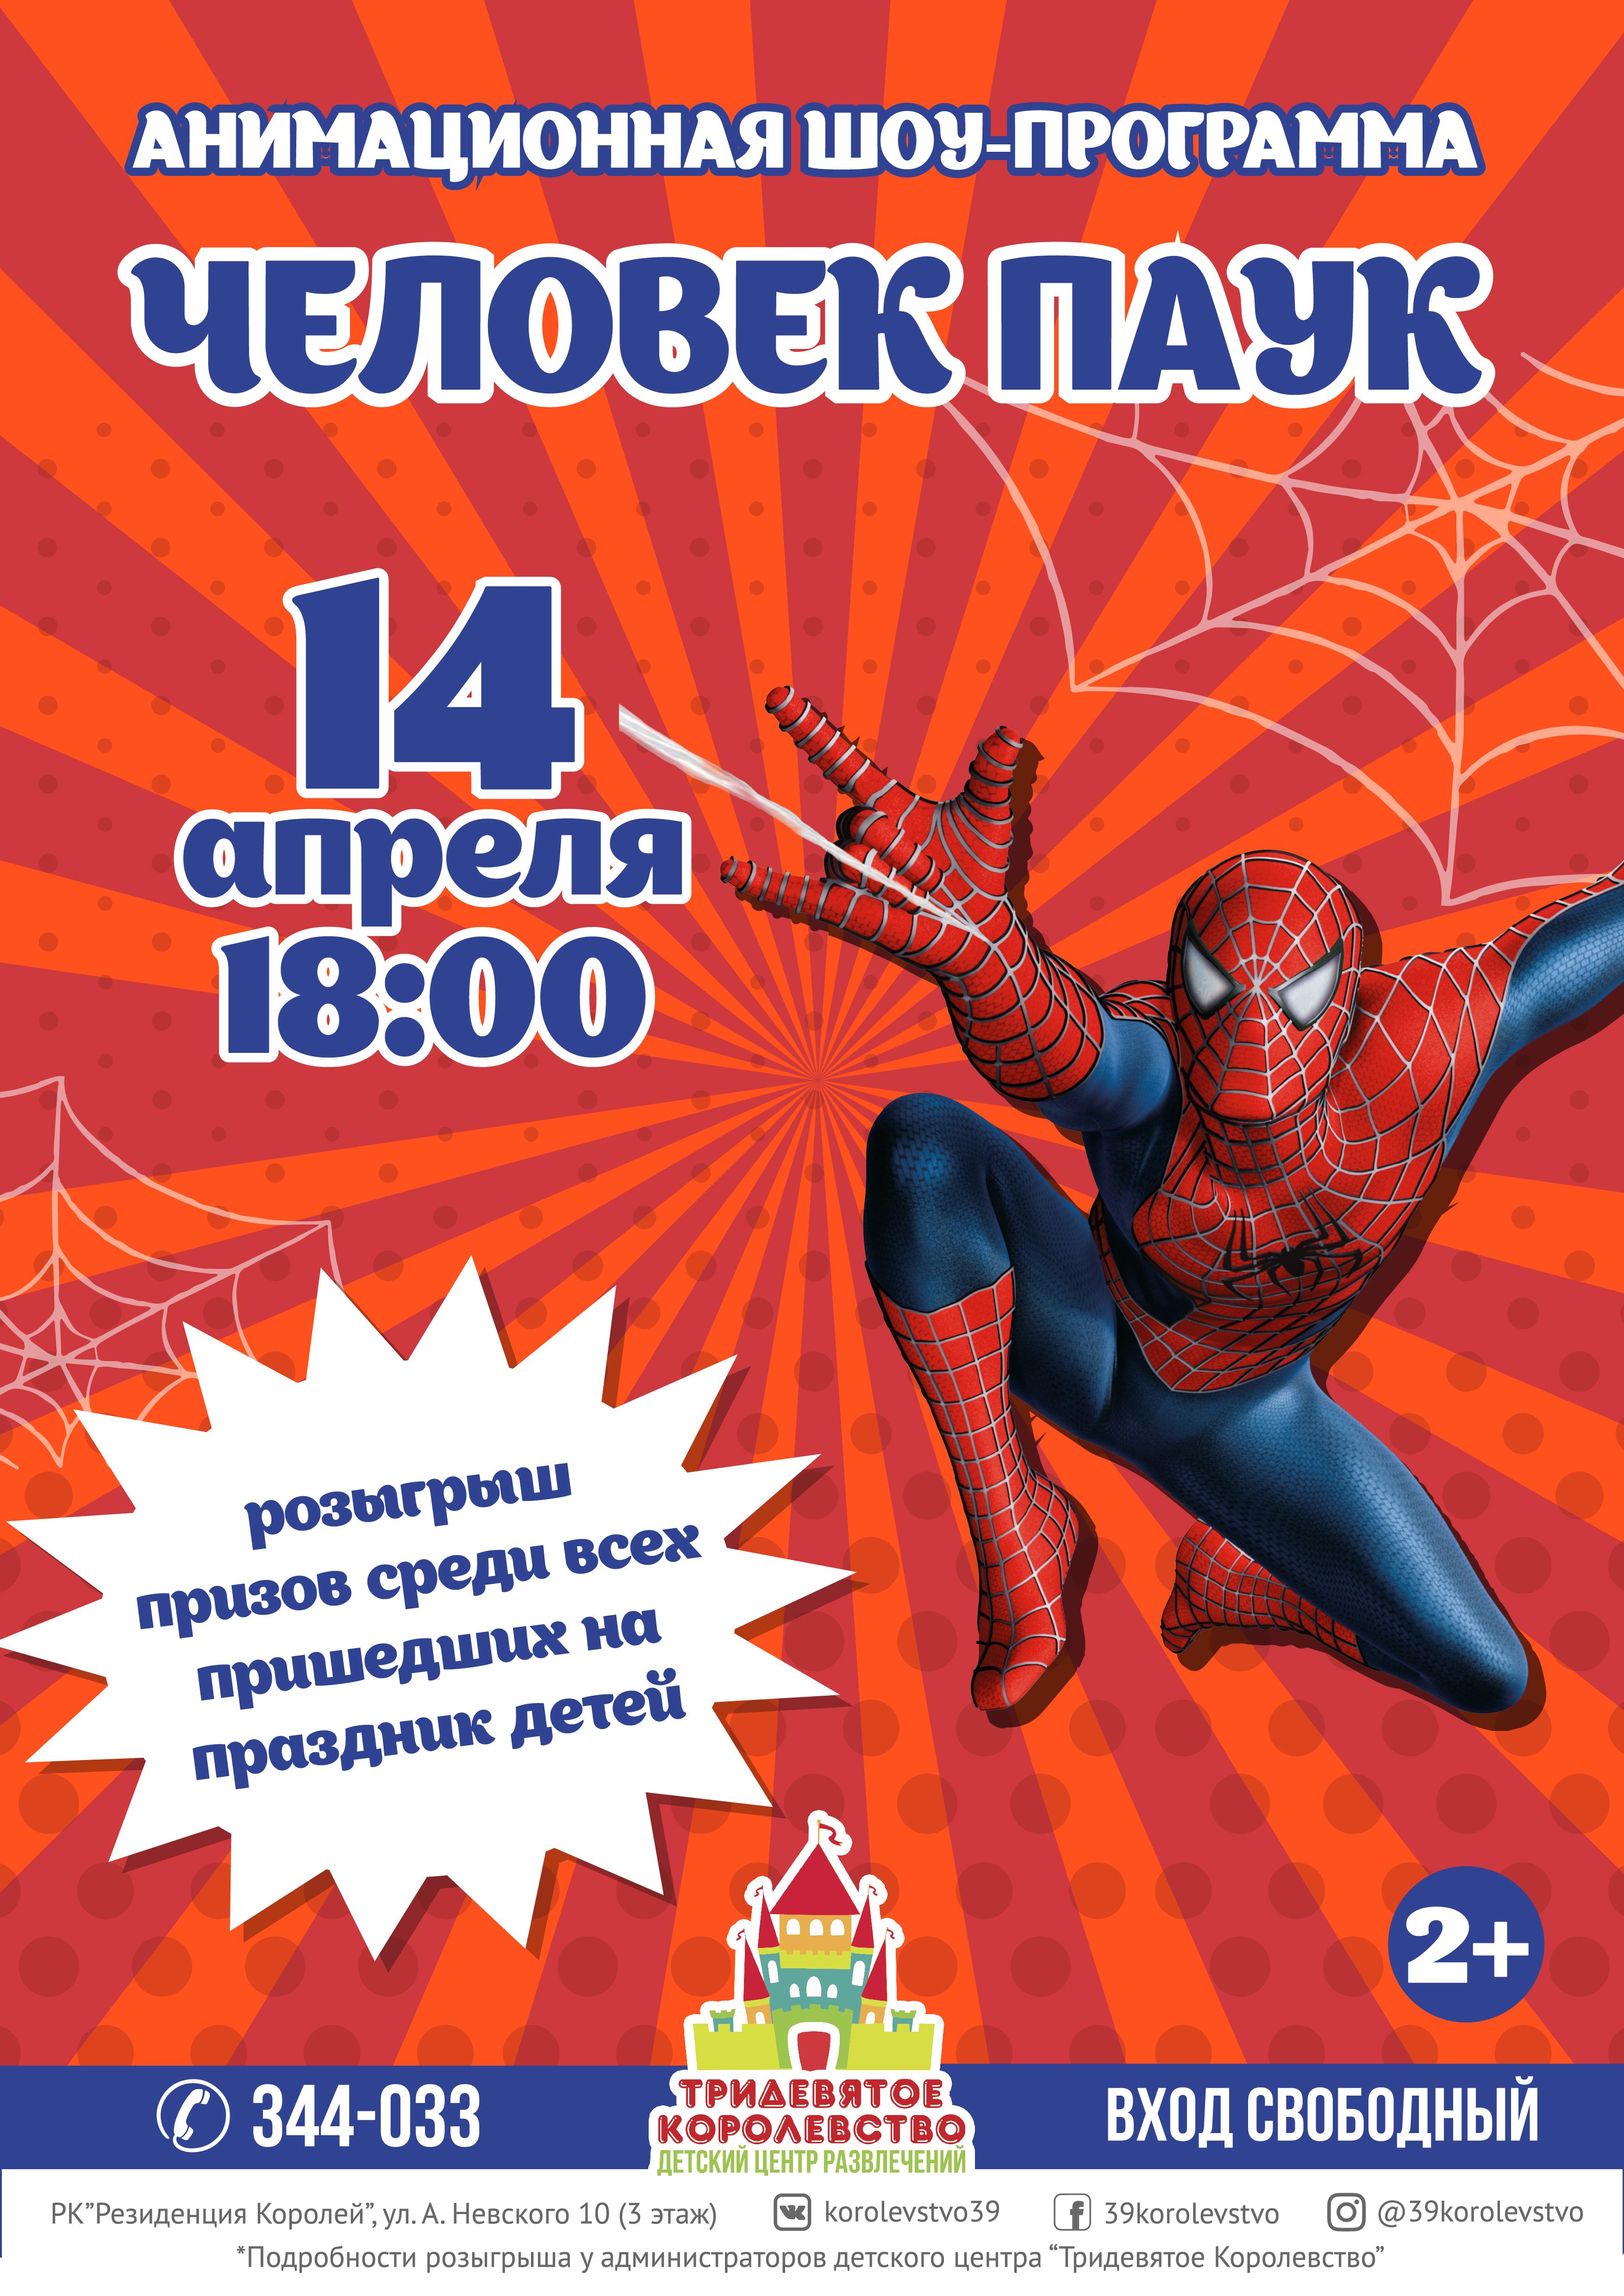 14 апреля Человек паук А1